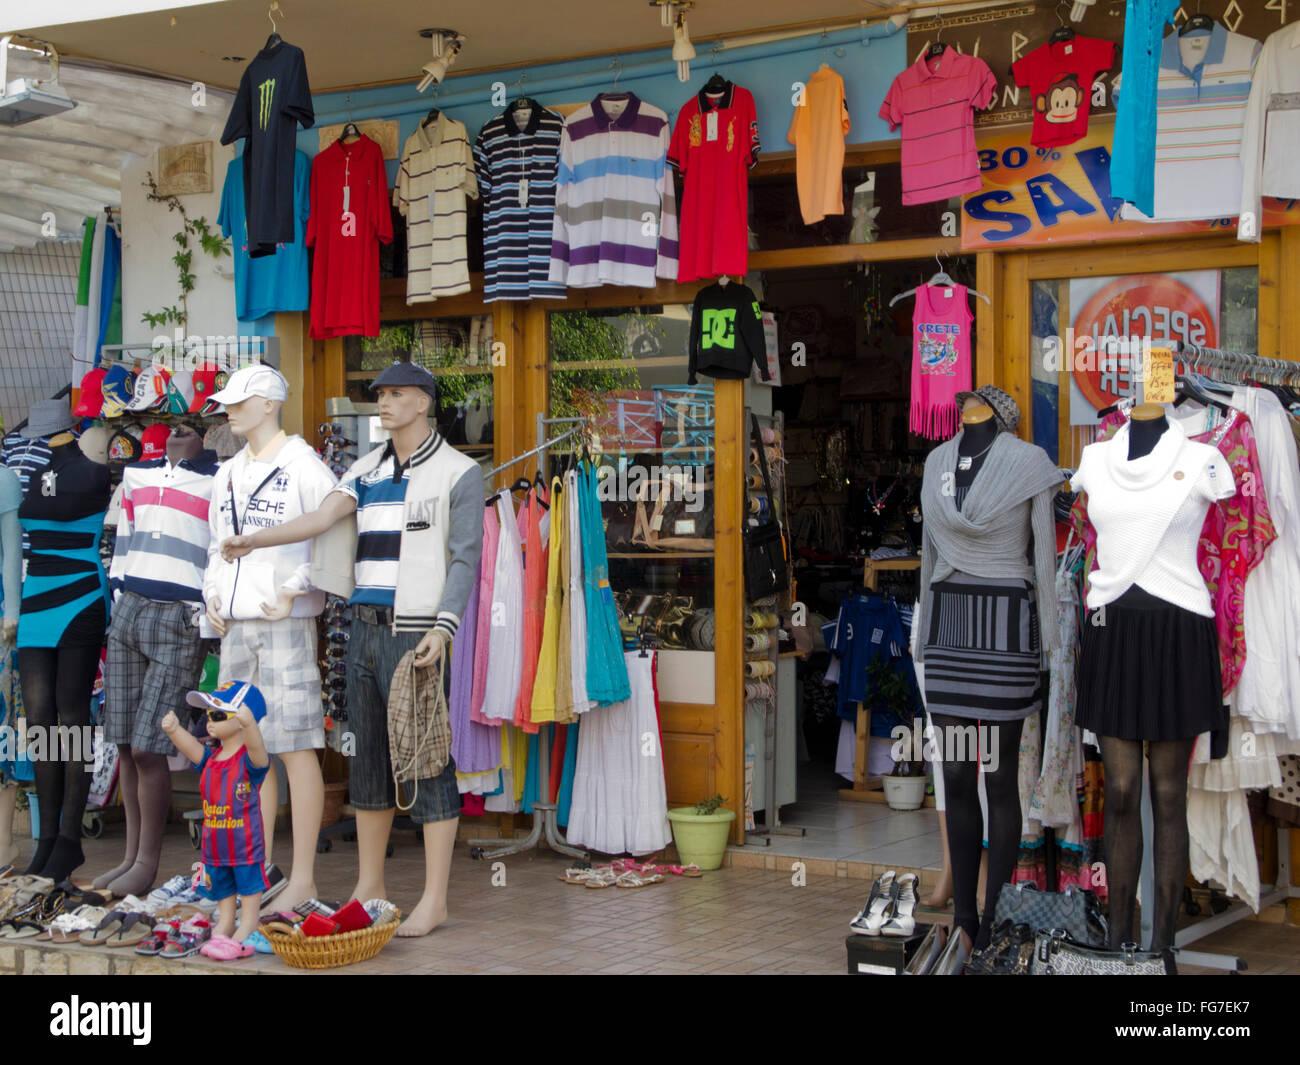 Griechenland, Kreta, Piskopiano bei Chersonissos, Touristenbedarf - Stock Image